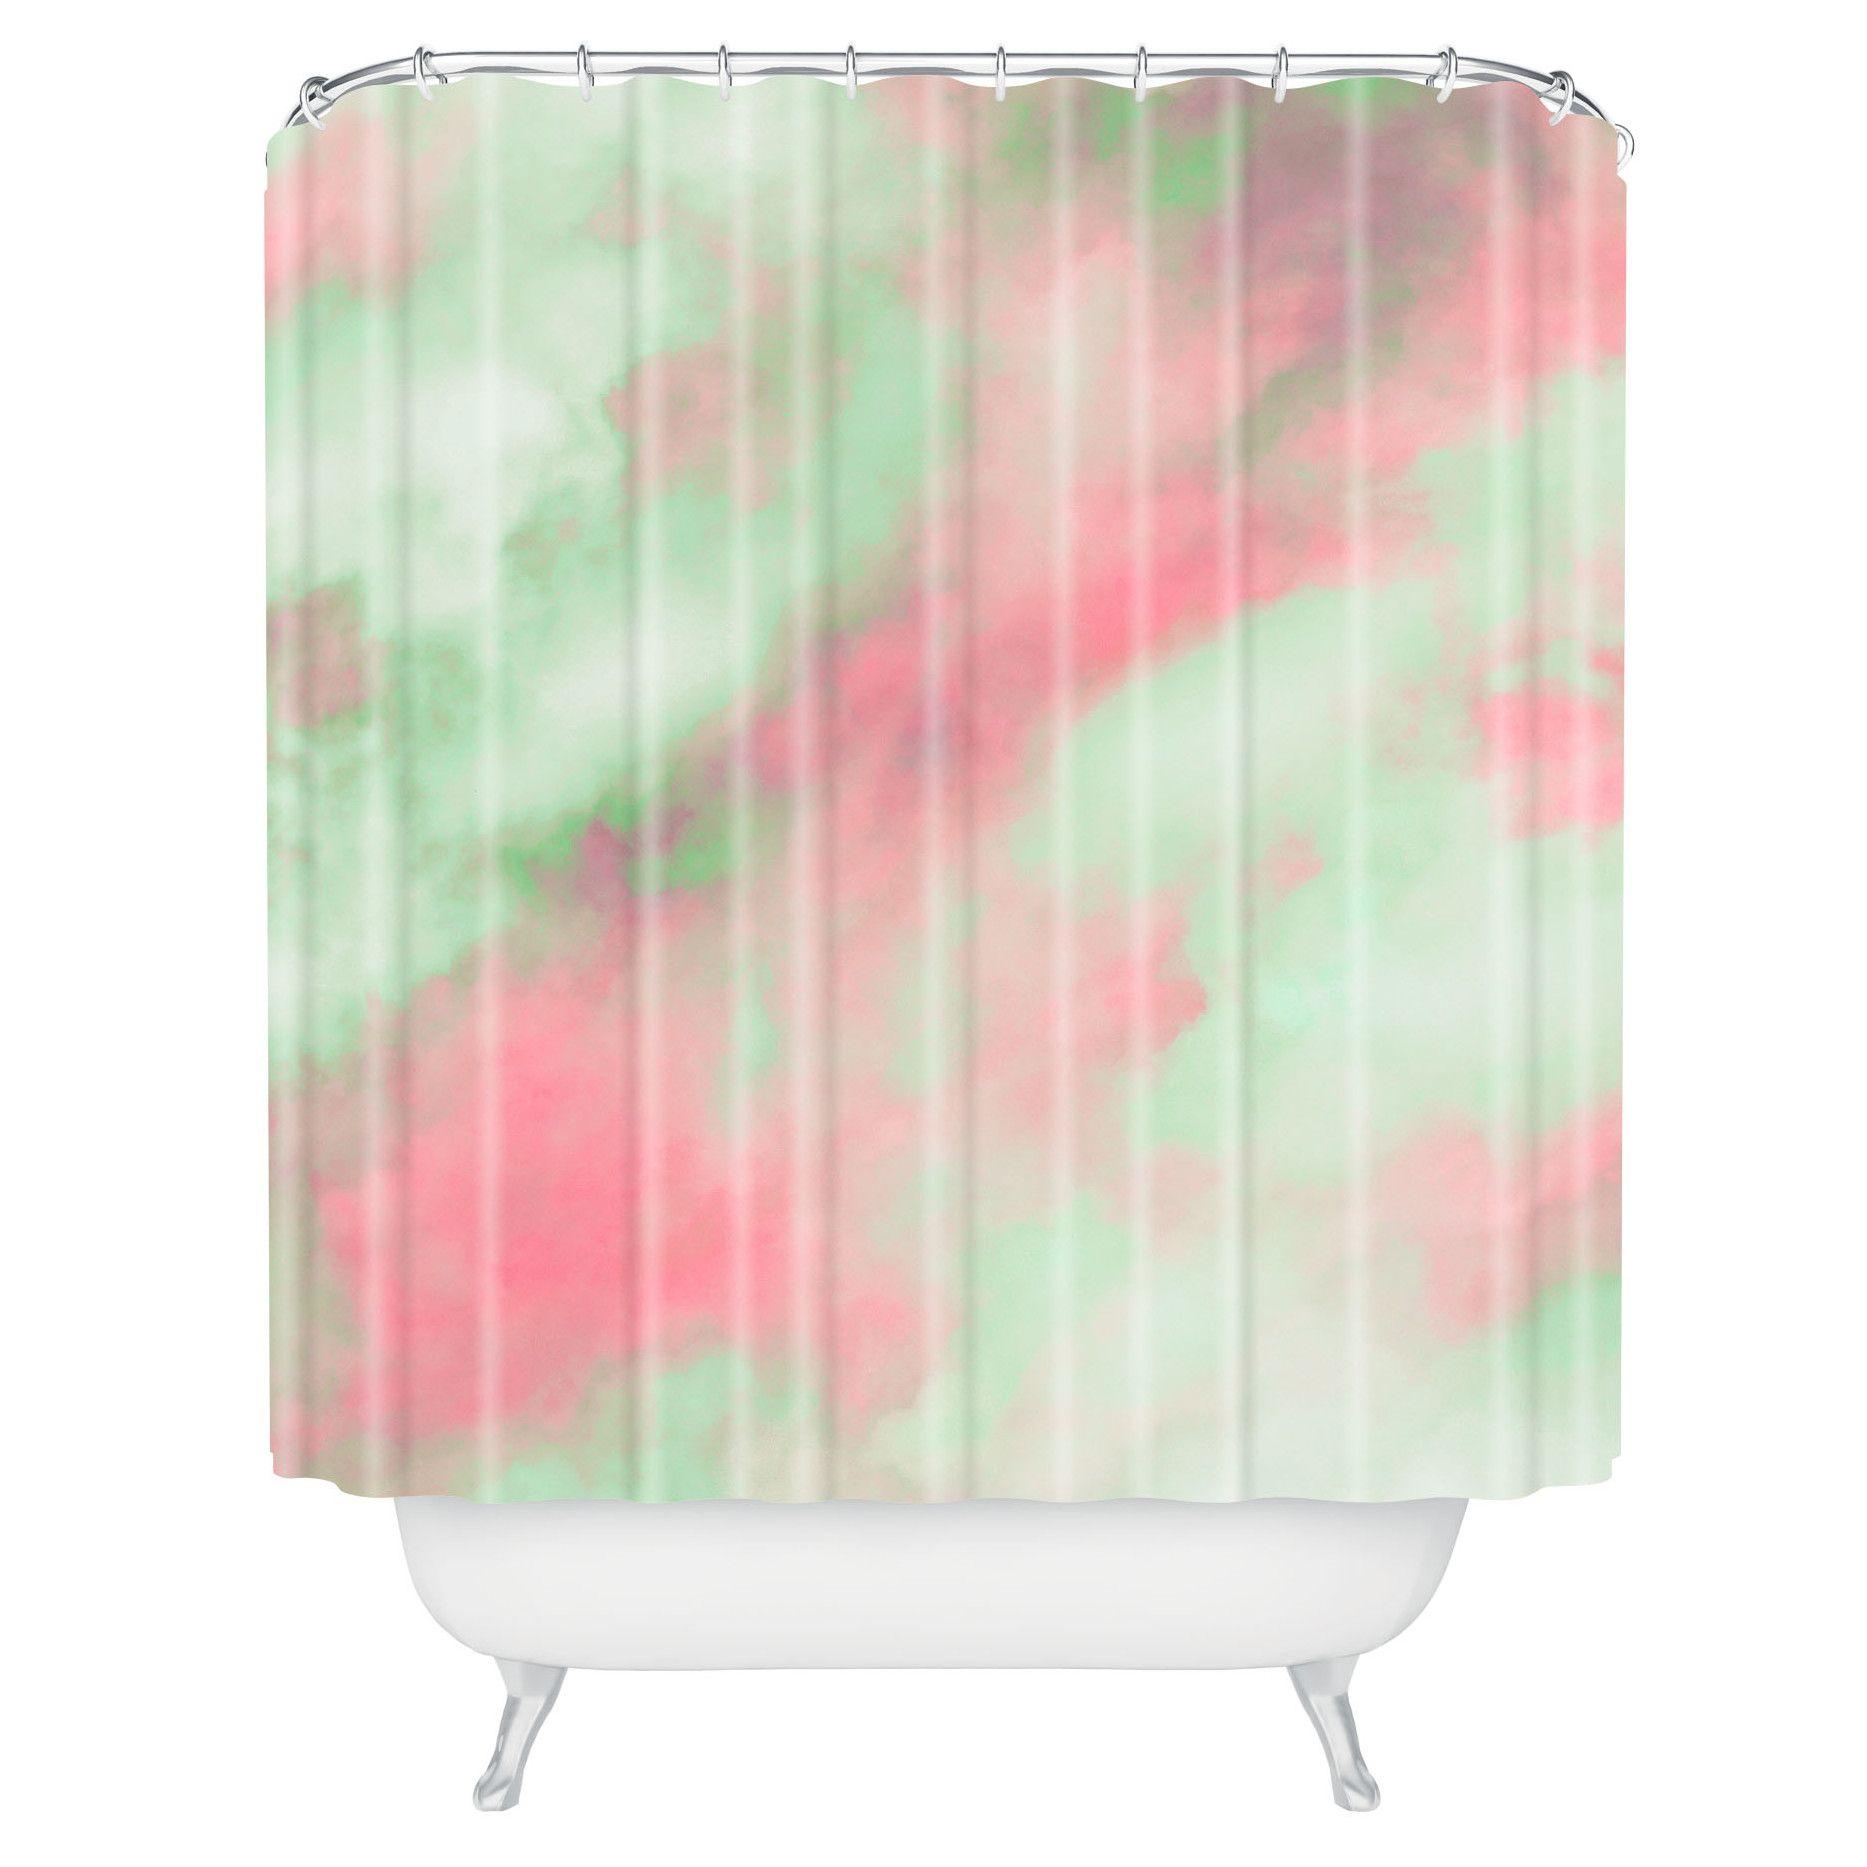 Dr Seuss Shower Curtain - Caleb troy pastel christmas shower curtain